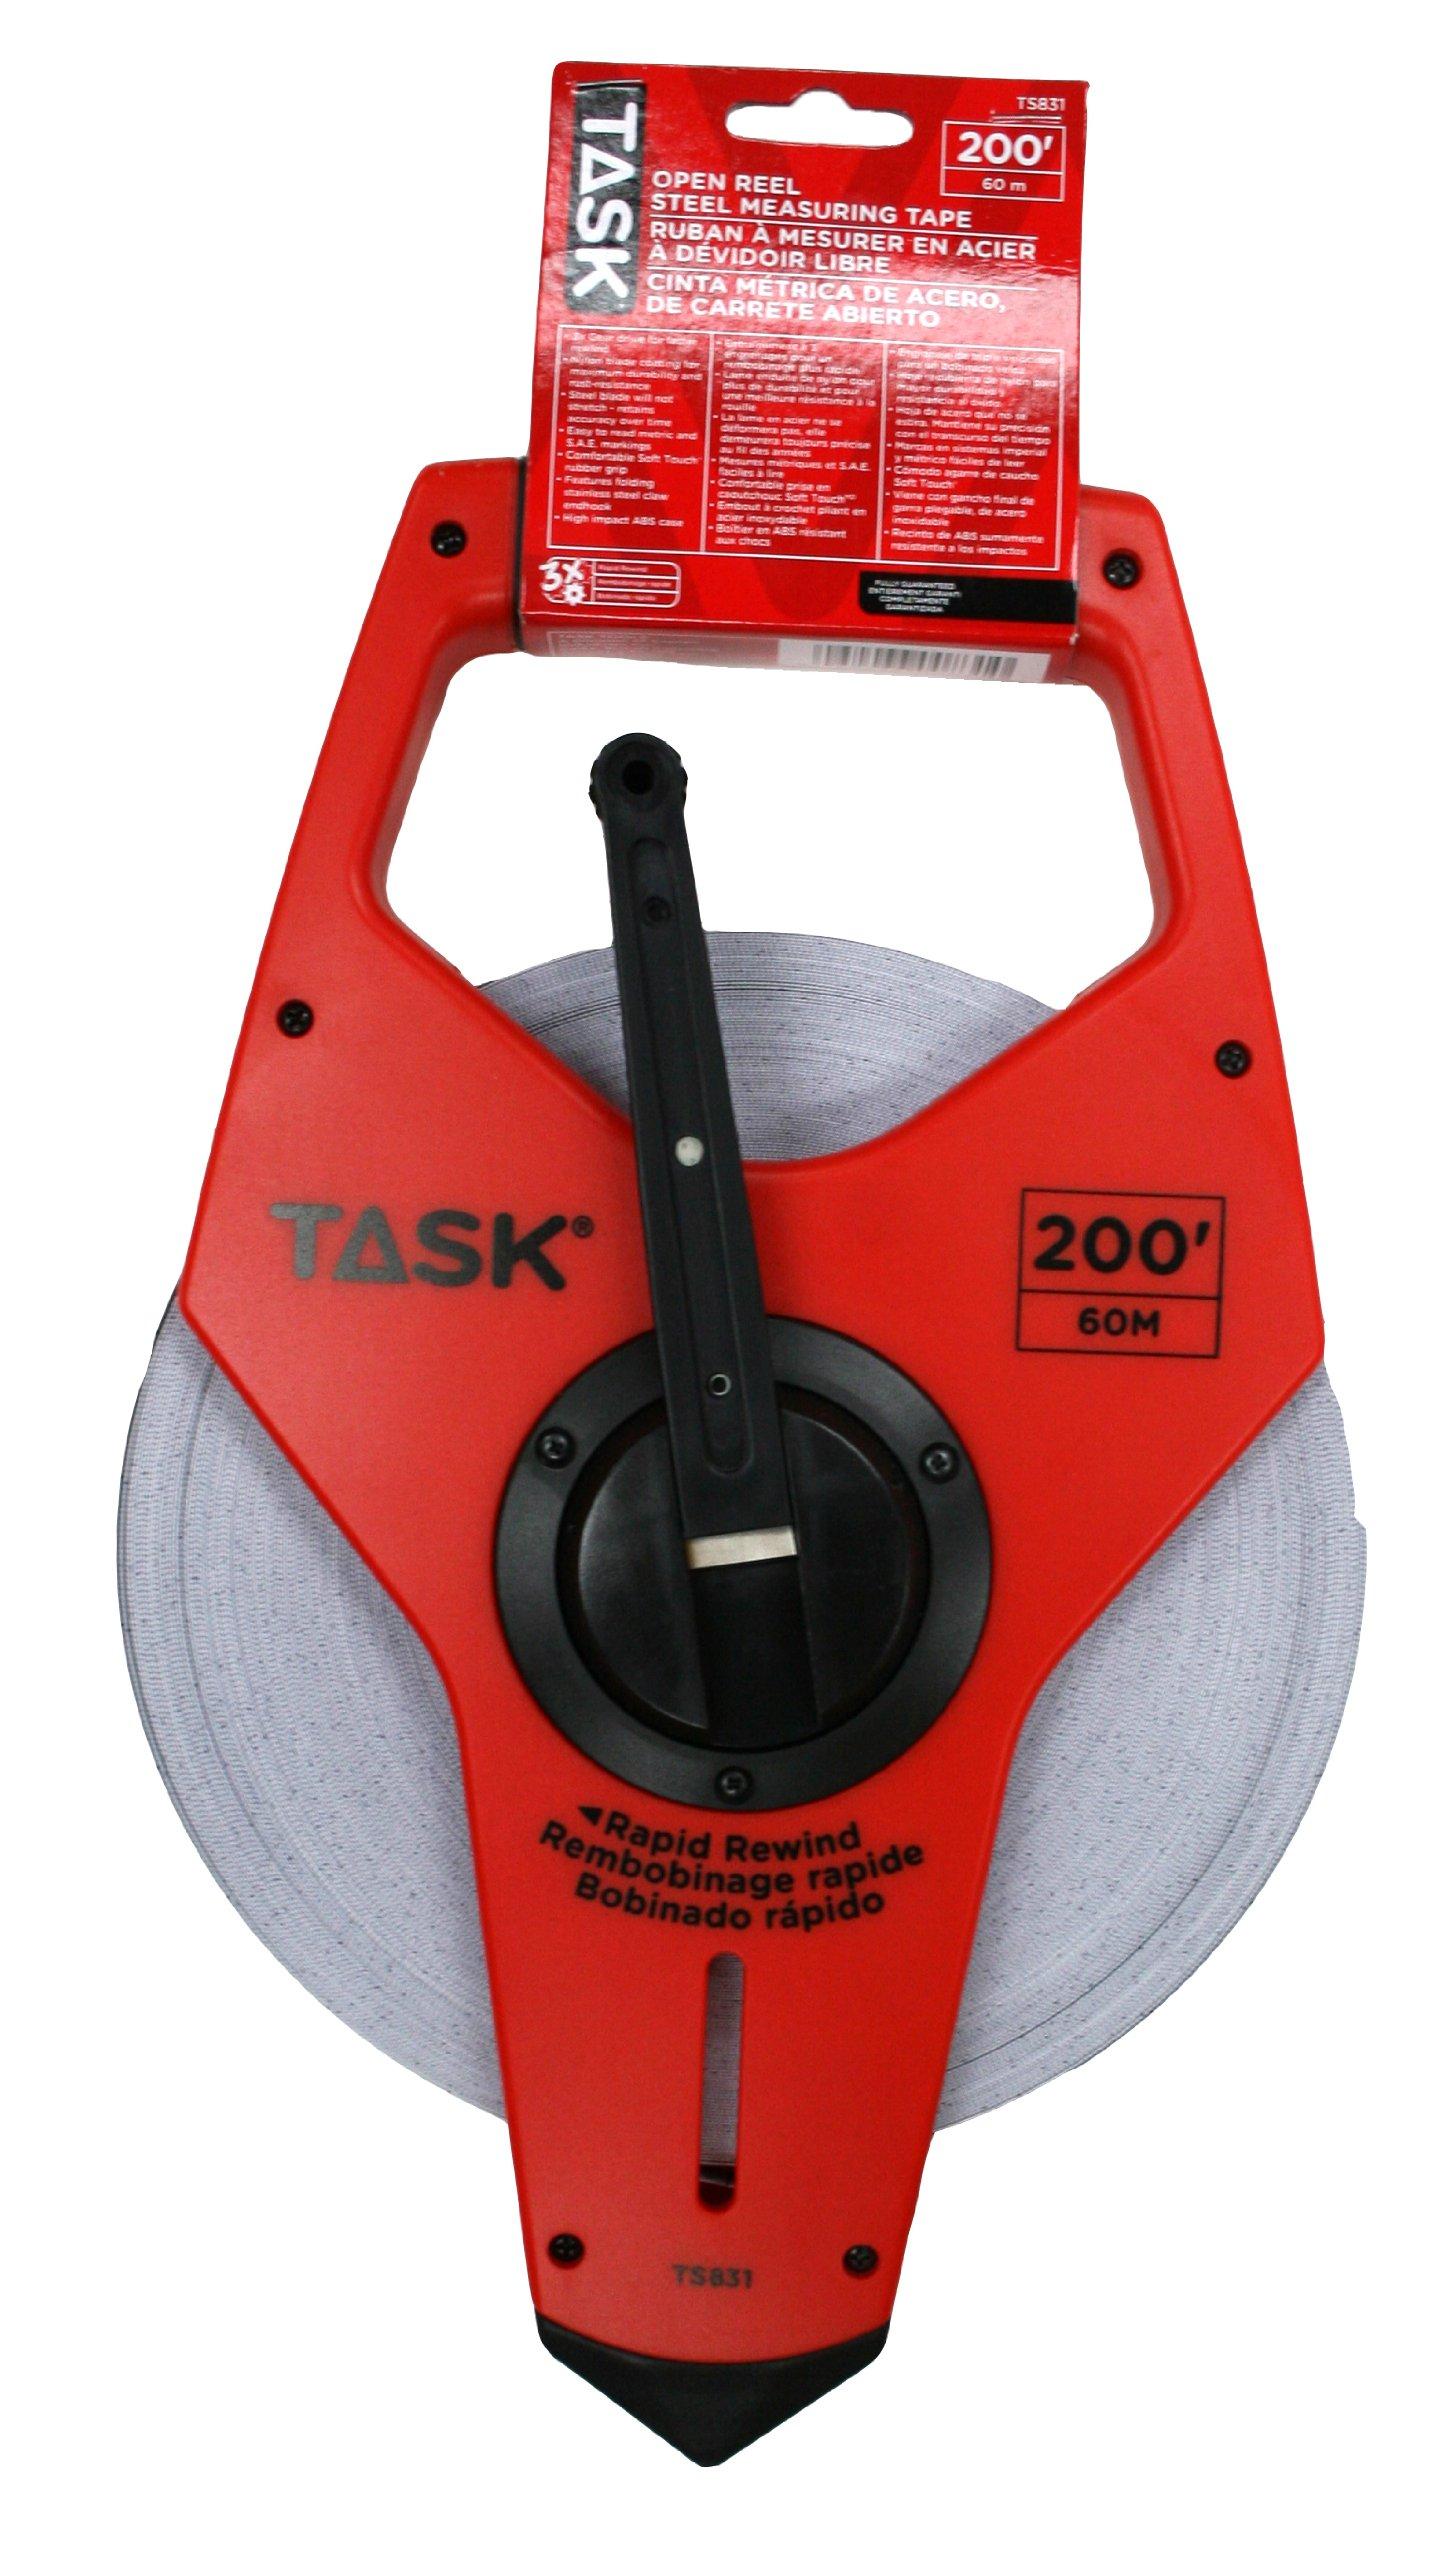 Task Tools TS831 200-Feet Open Reel Fiberglass Tape Measure, Nylon-Coated with  3X Gear Drive